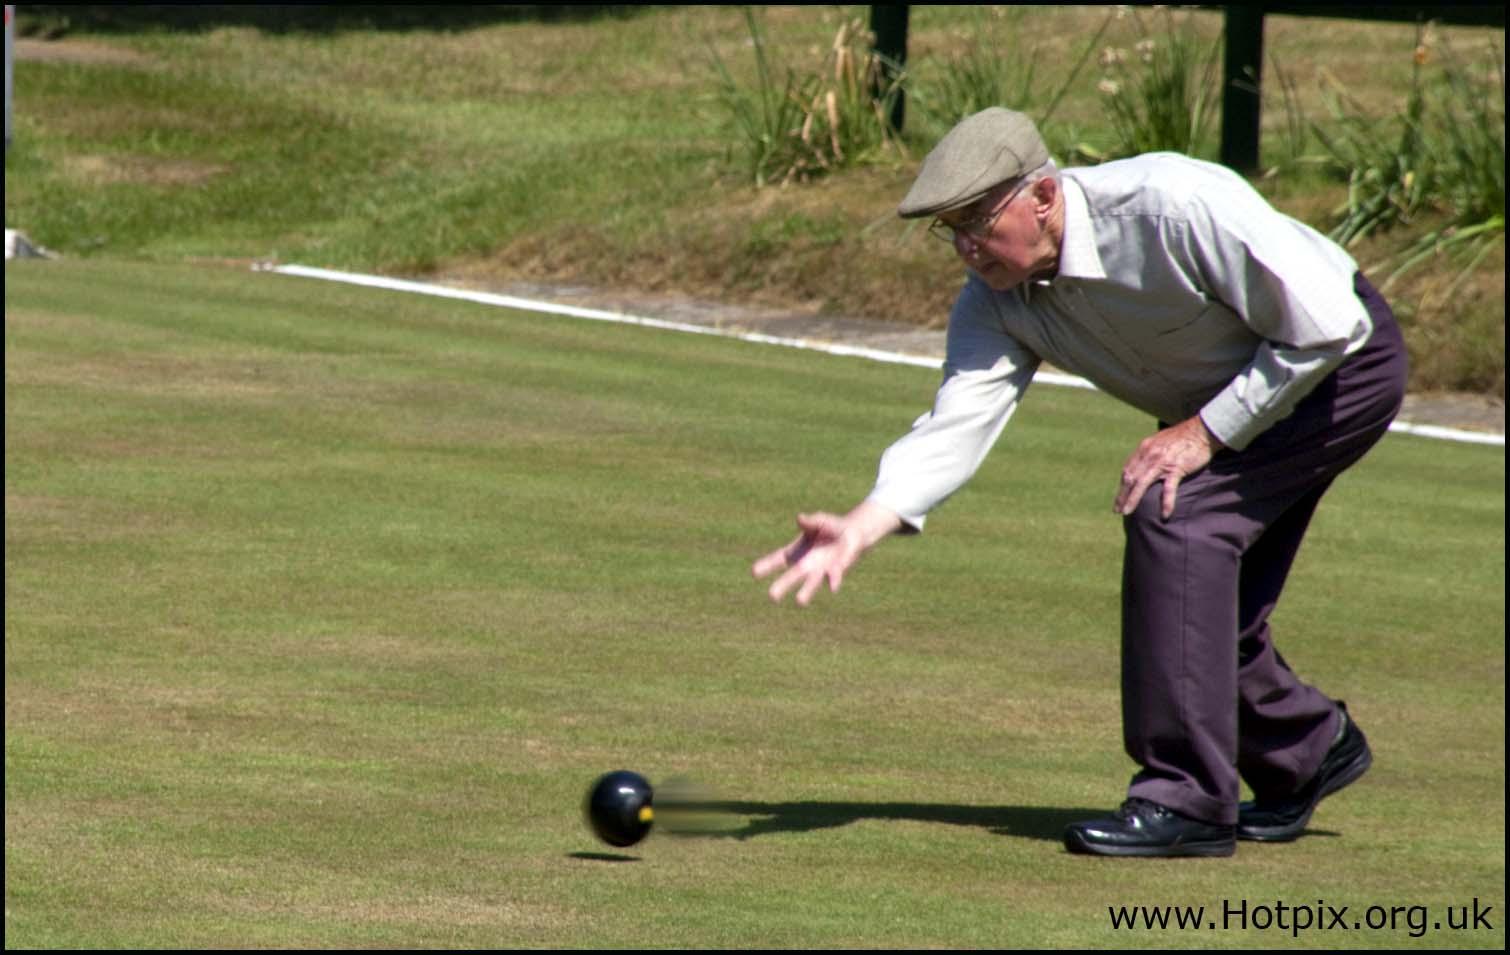 Cheshire,Northwich,cuddington,bowling,sport,club,summer,green,grass,play,player,playing,hotpix!